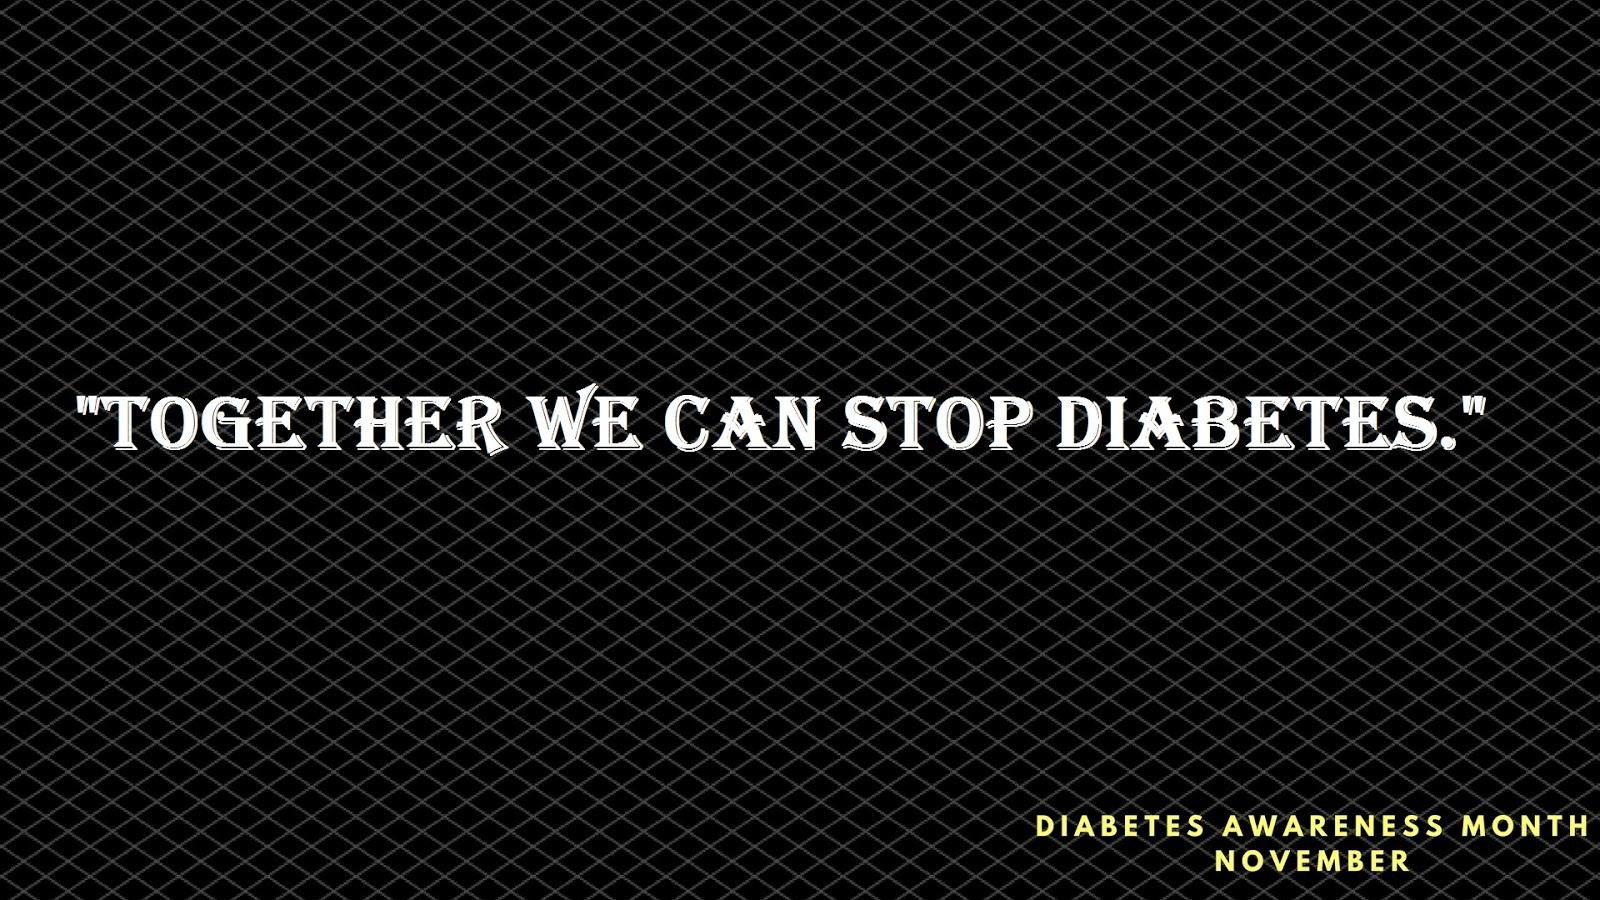 world diabetes day slogans